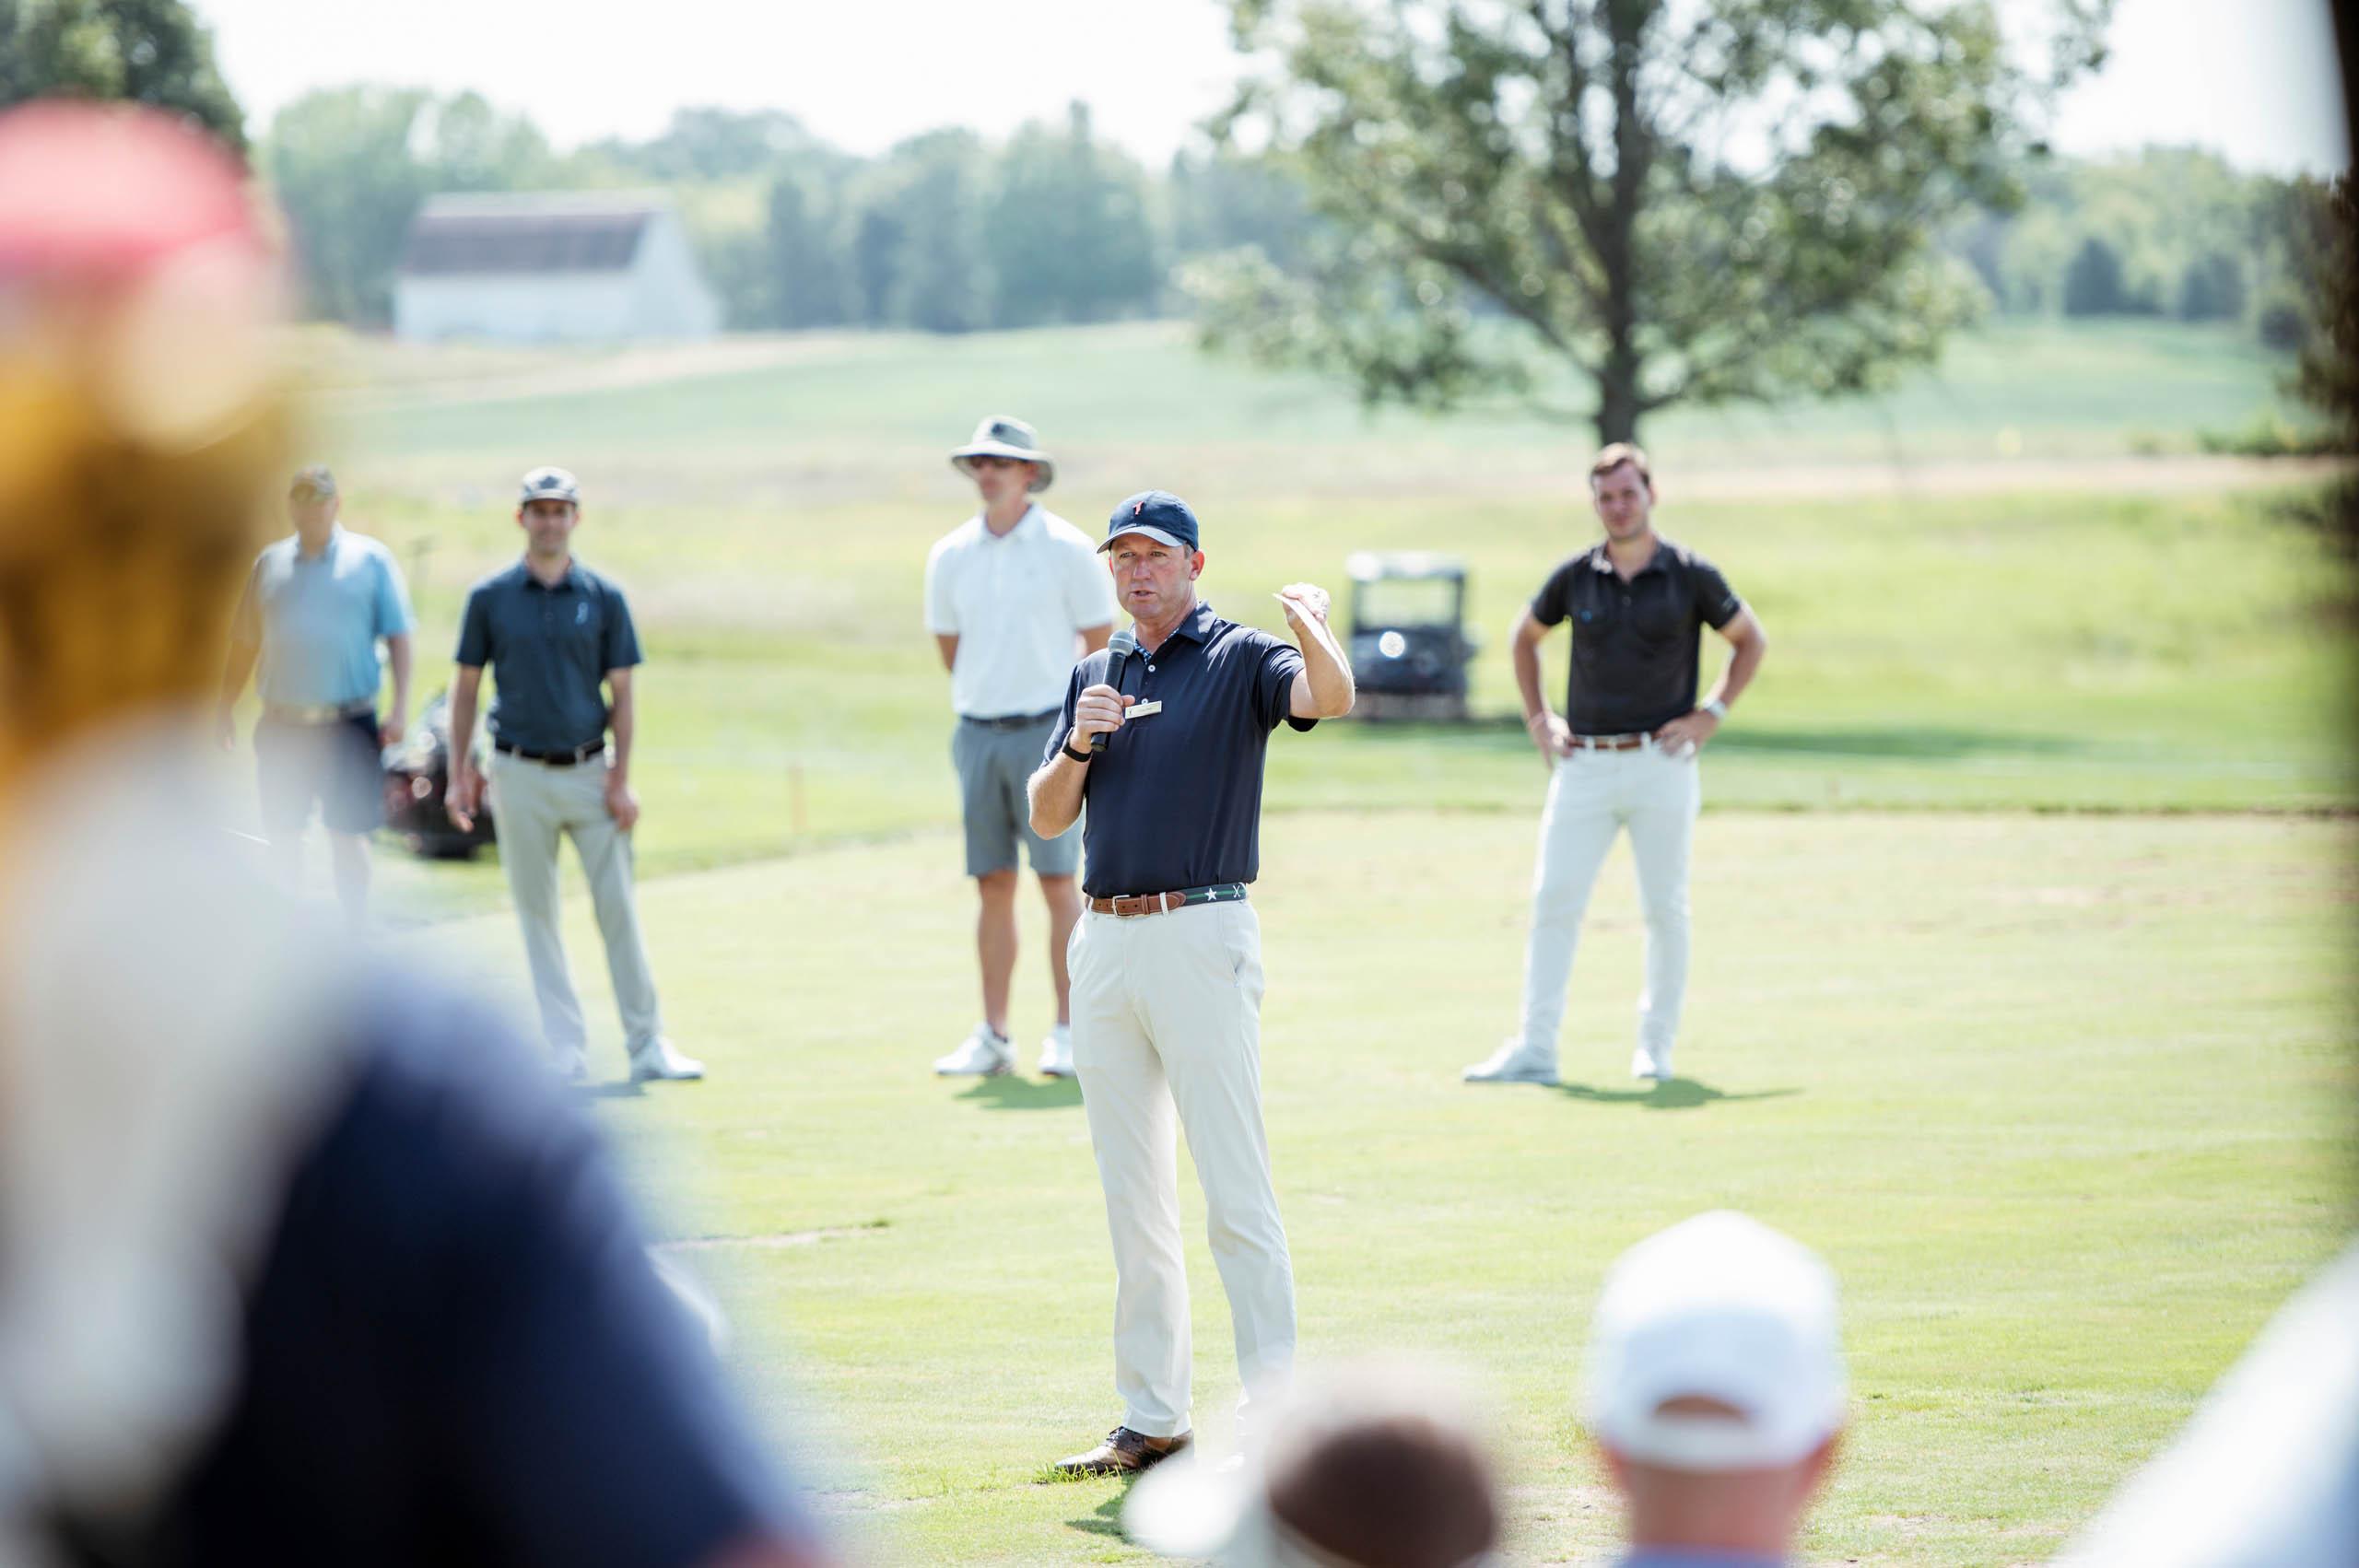 Chandler's Plan - The Golfer's Journal